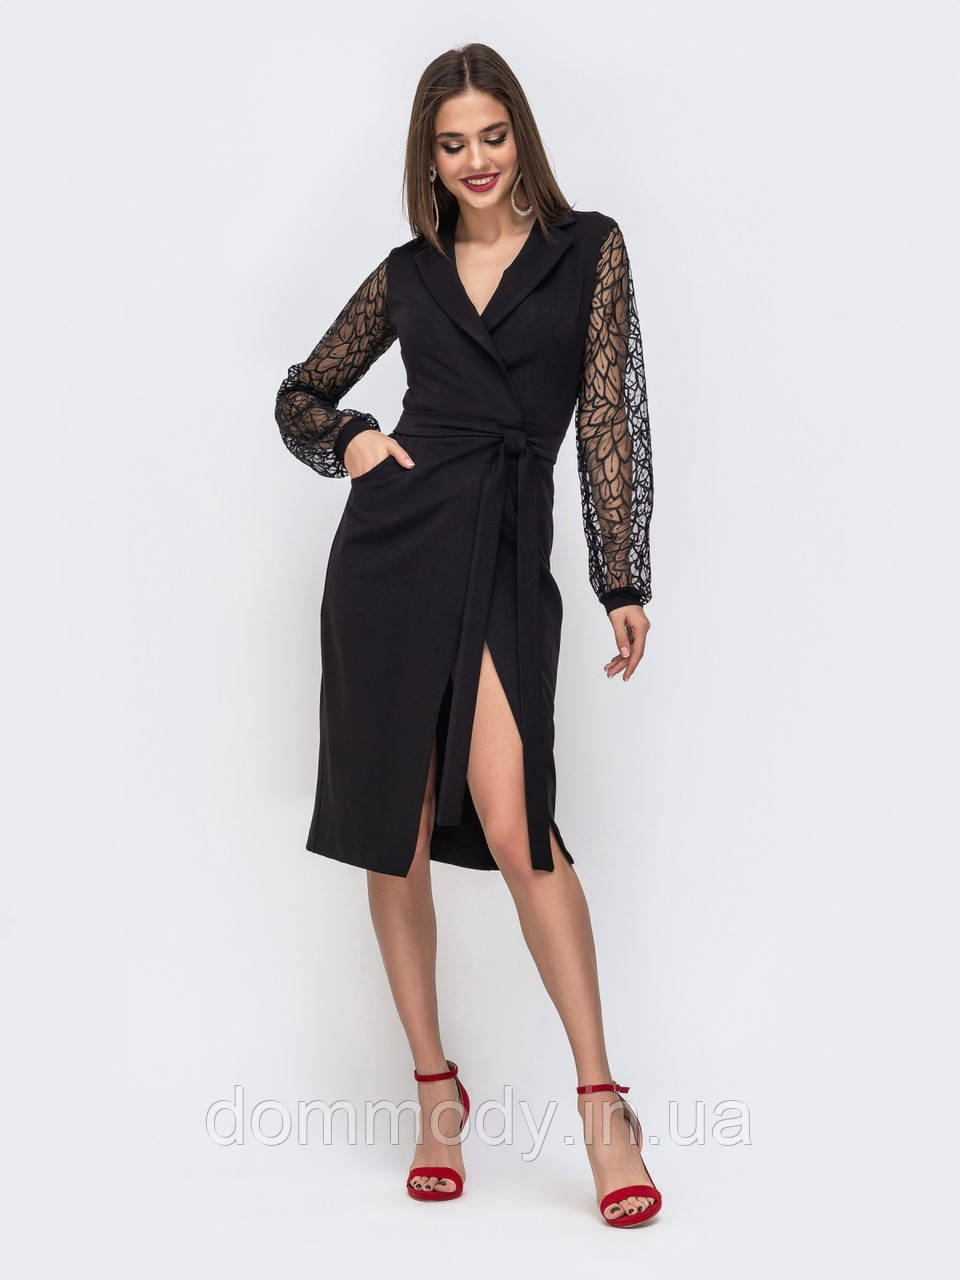 Платье женское Cherida black